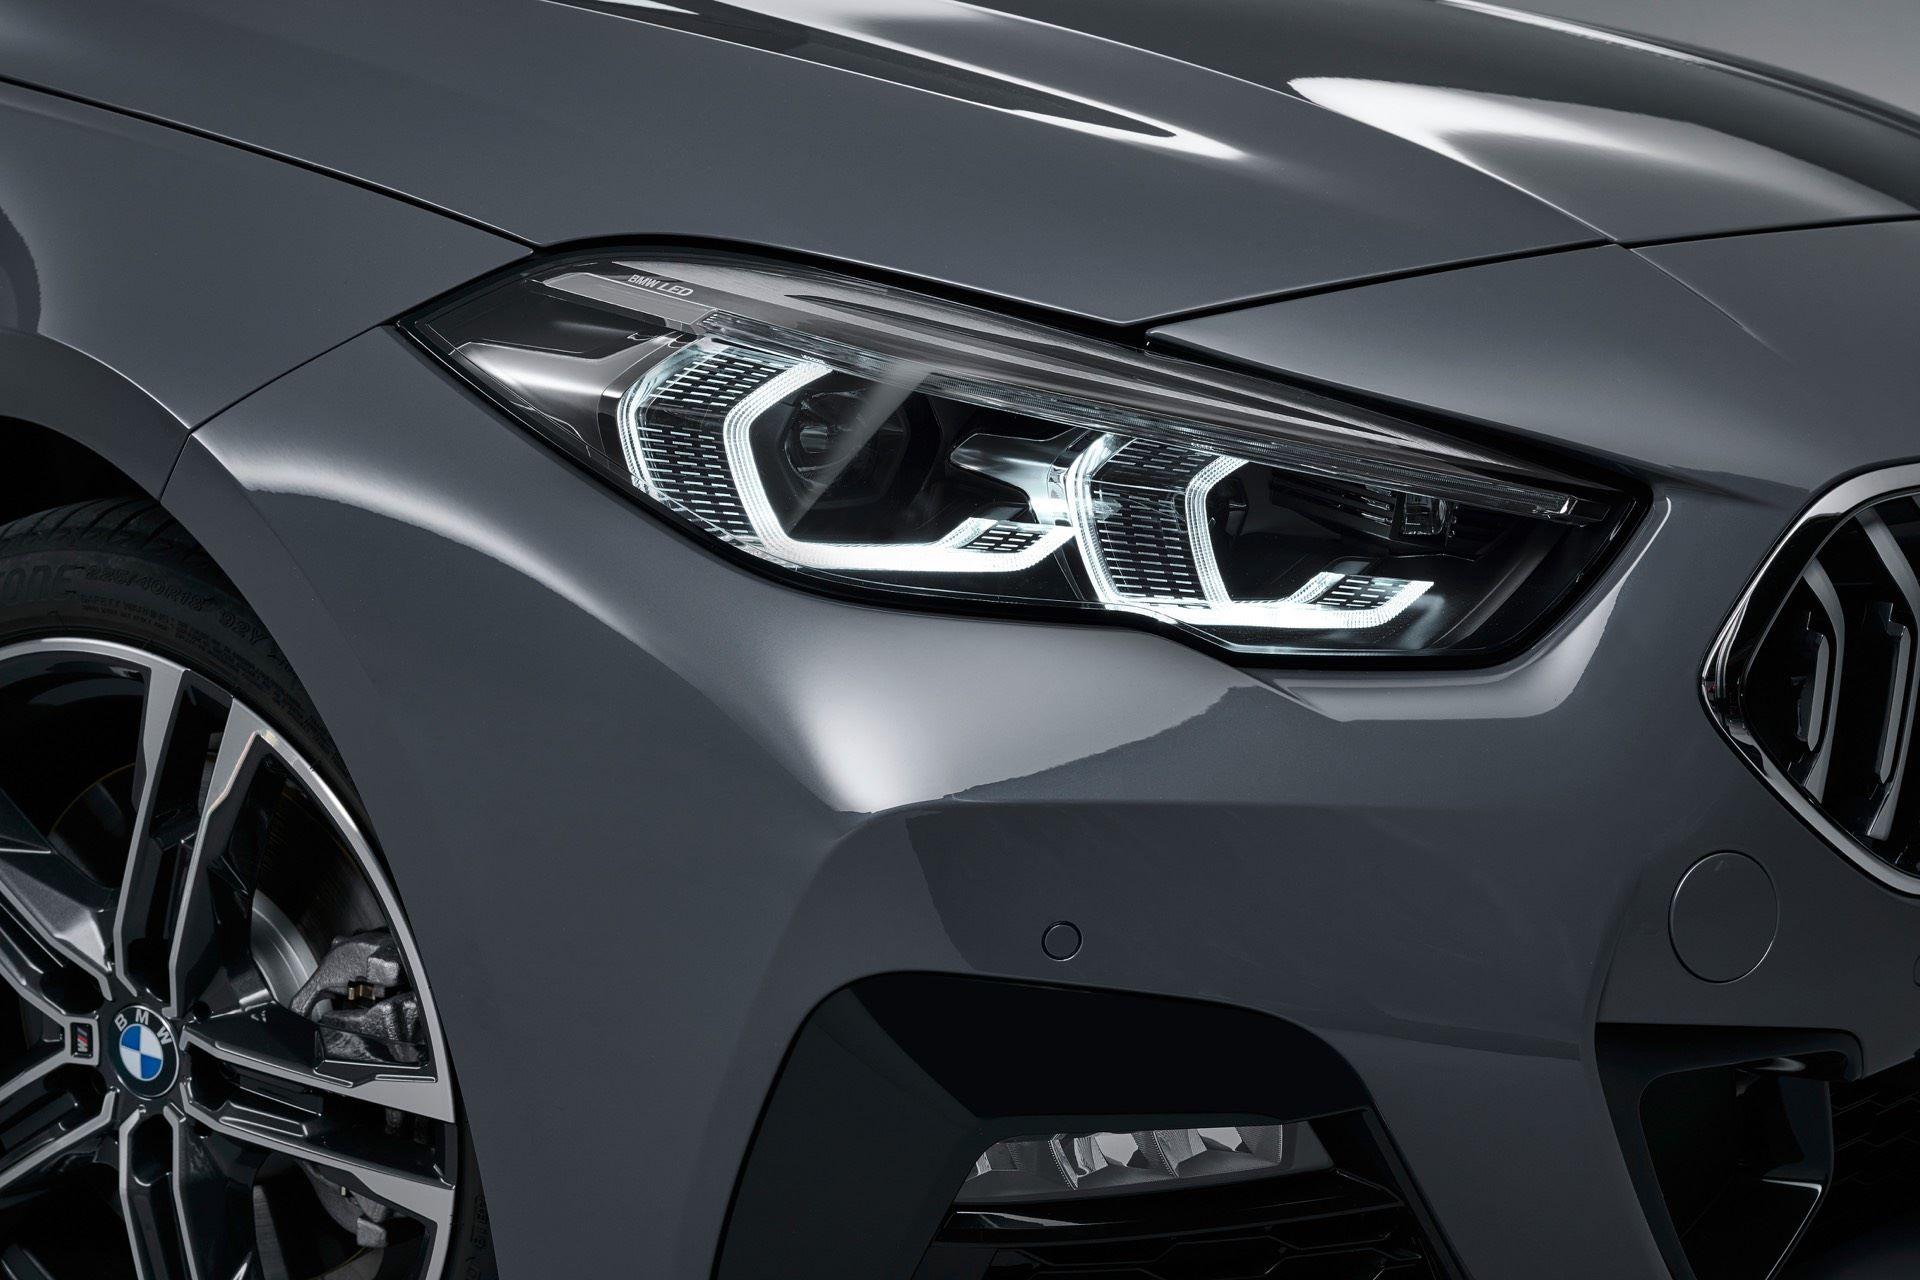 BMW-2-Series-Gran-Coupe-Studio-Photos10